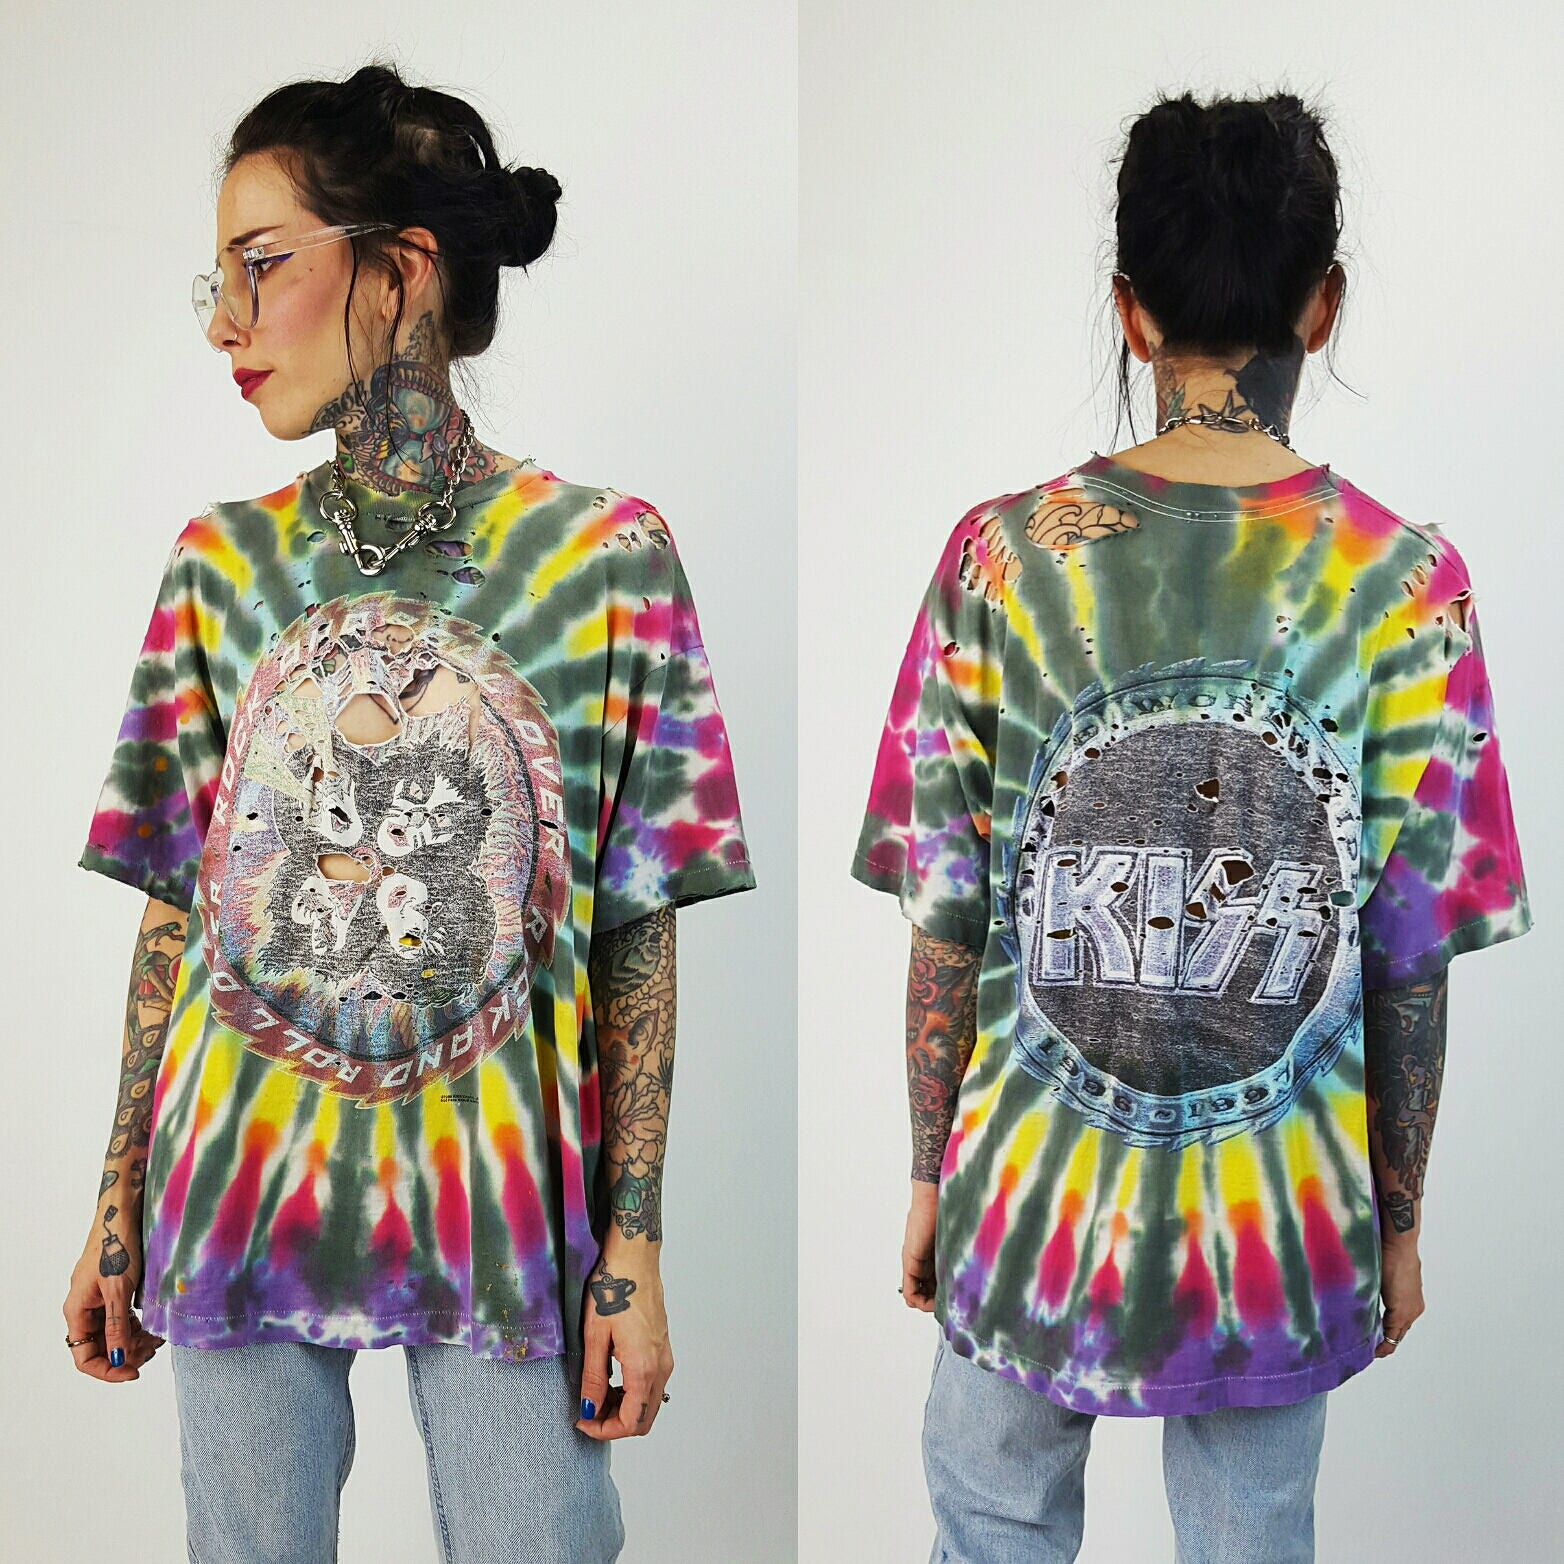 90s Kiss Tour Tee Xl Holey Unisex Alive Worldwide Concert T Shirt